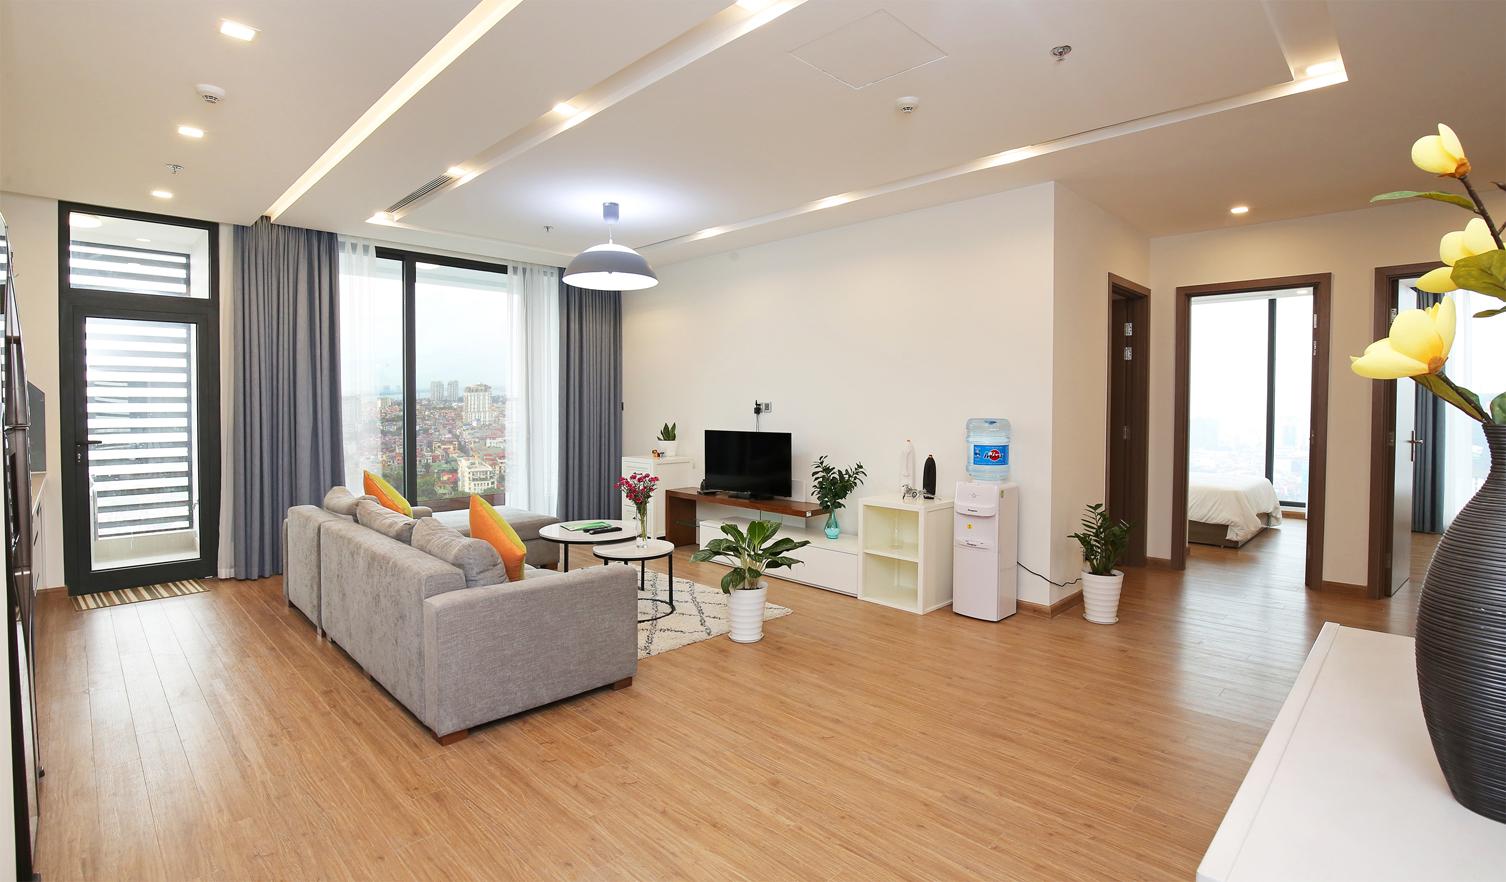 04 Bedroom Apartment in Vinhomes Metropolis Hanoi